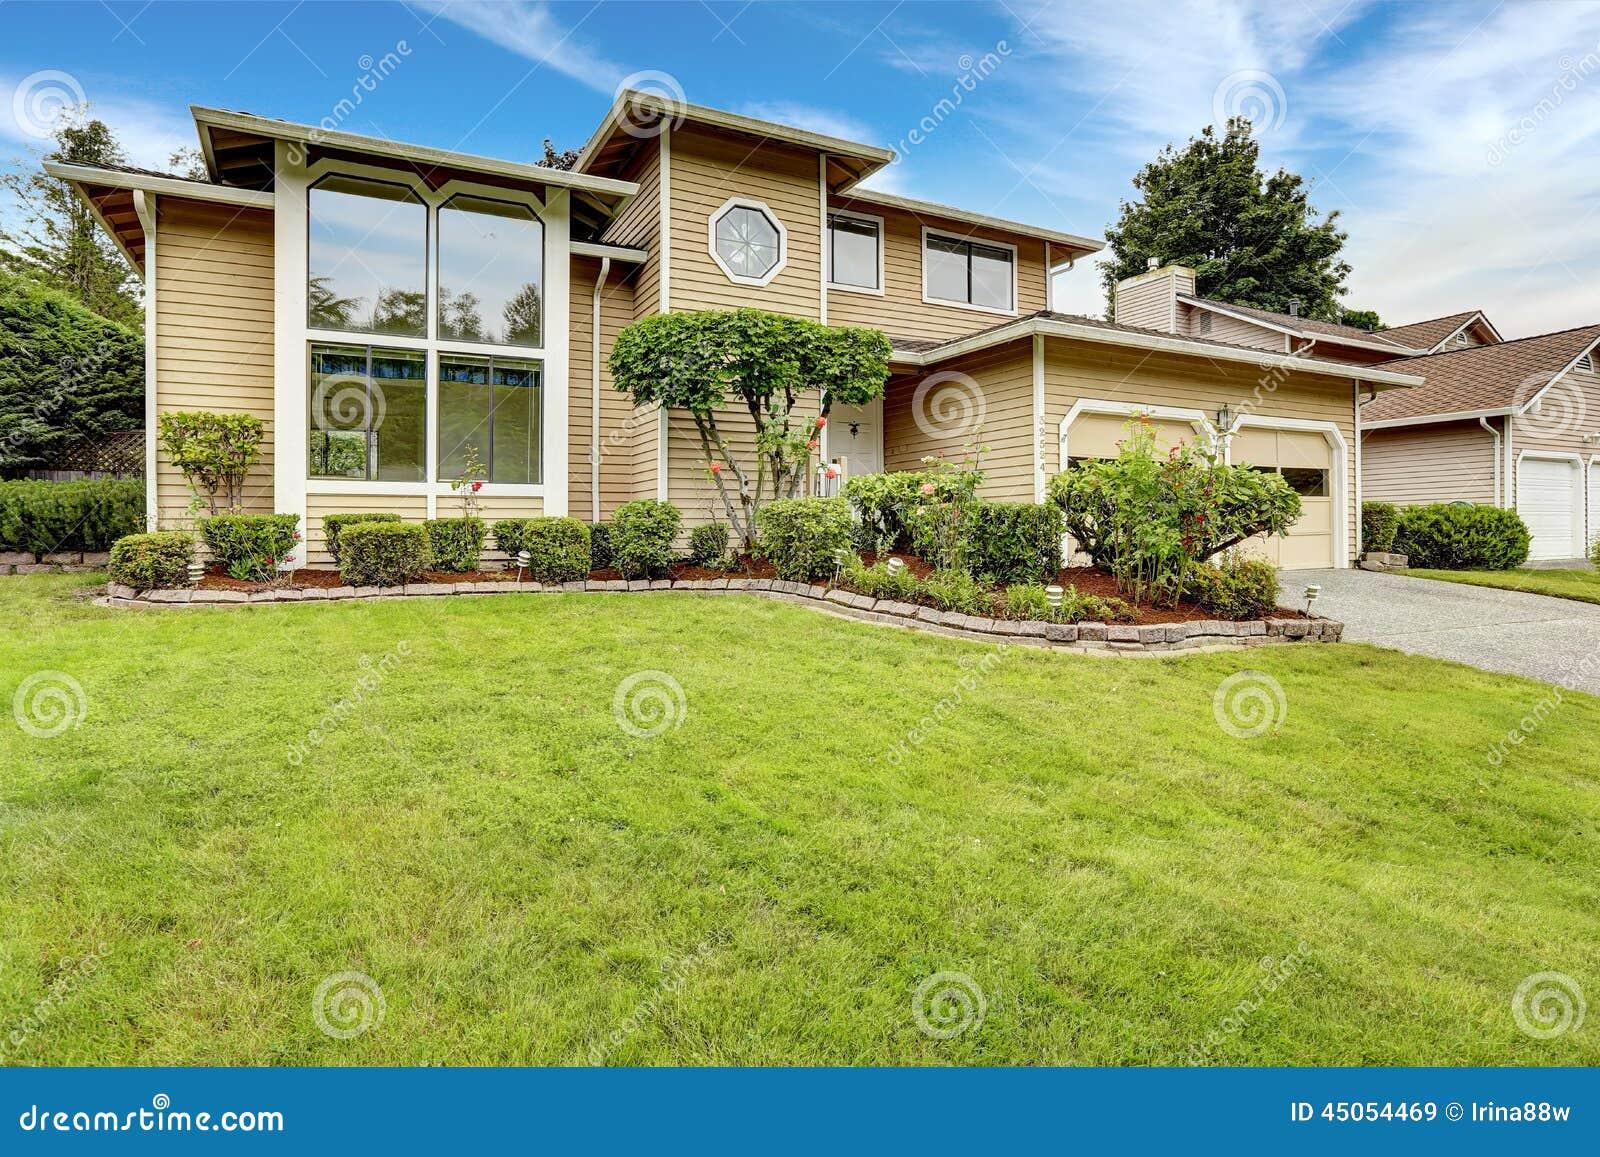 house exterior large window front yard landscape design clapboard siding beautiful flower bed 45054469